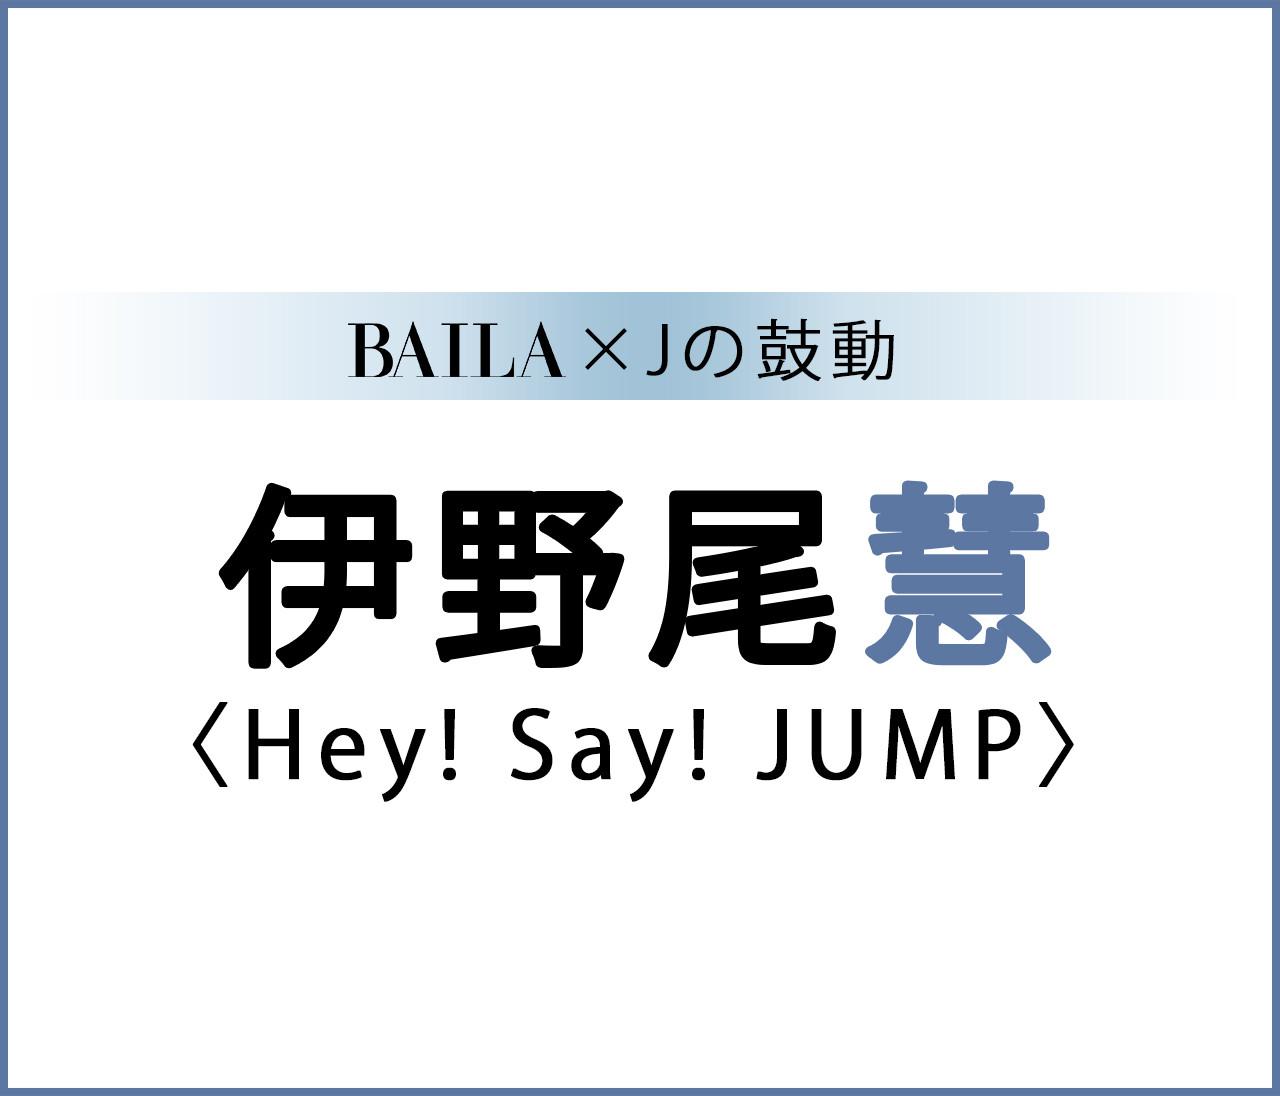 【 #HeySayJUMP #伊野尾慧 】Hey! Say! JUMP 伊野尾慧スペシャルインタビュー!【BAILA × Jの鼓動】